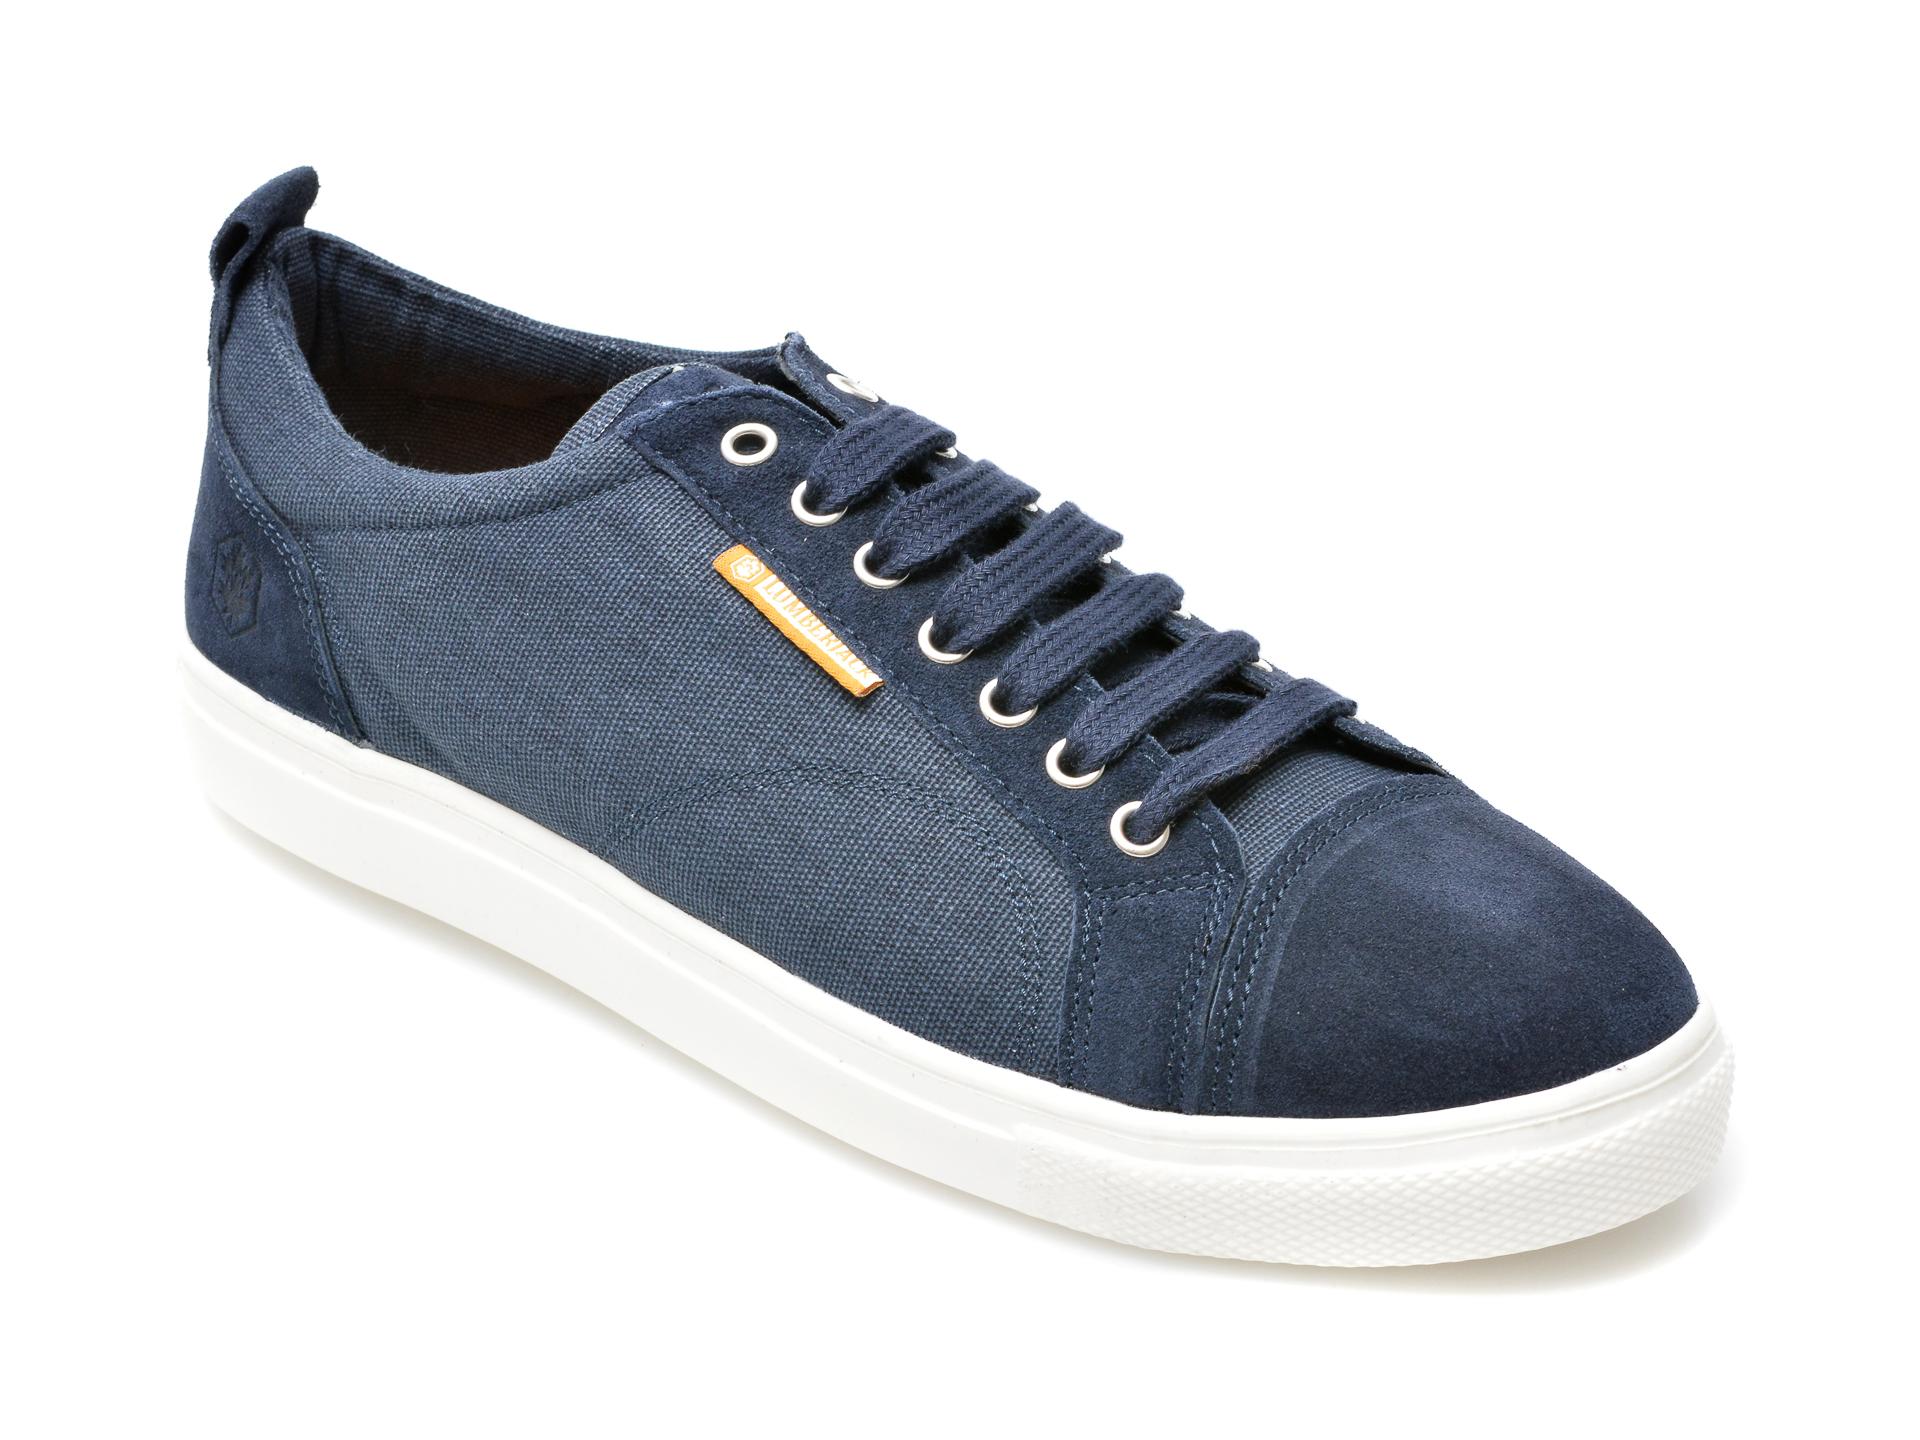 Pantofi Sport Lumberjack Bleumarin, B551002, Din Material Textil Si Piele Intoarsa